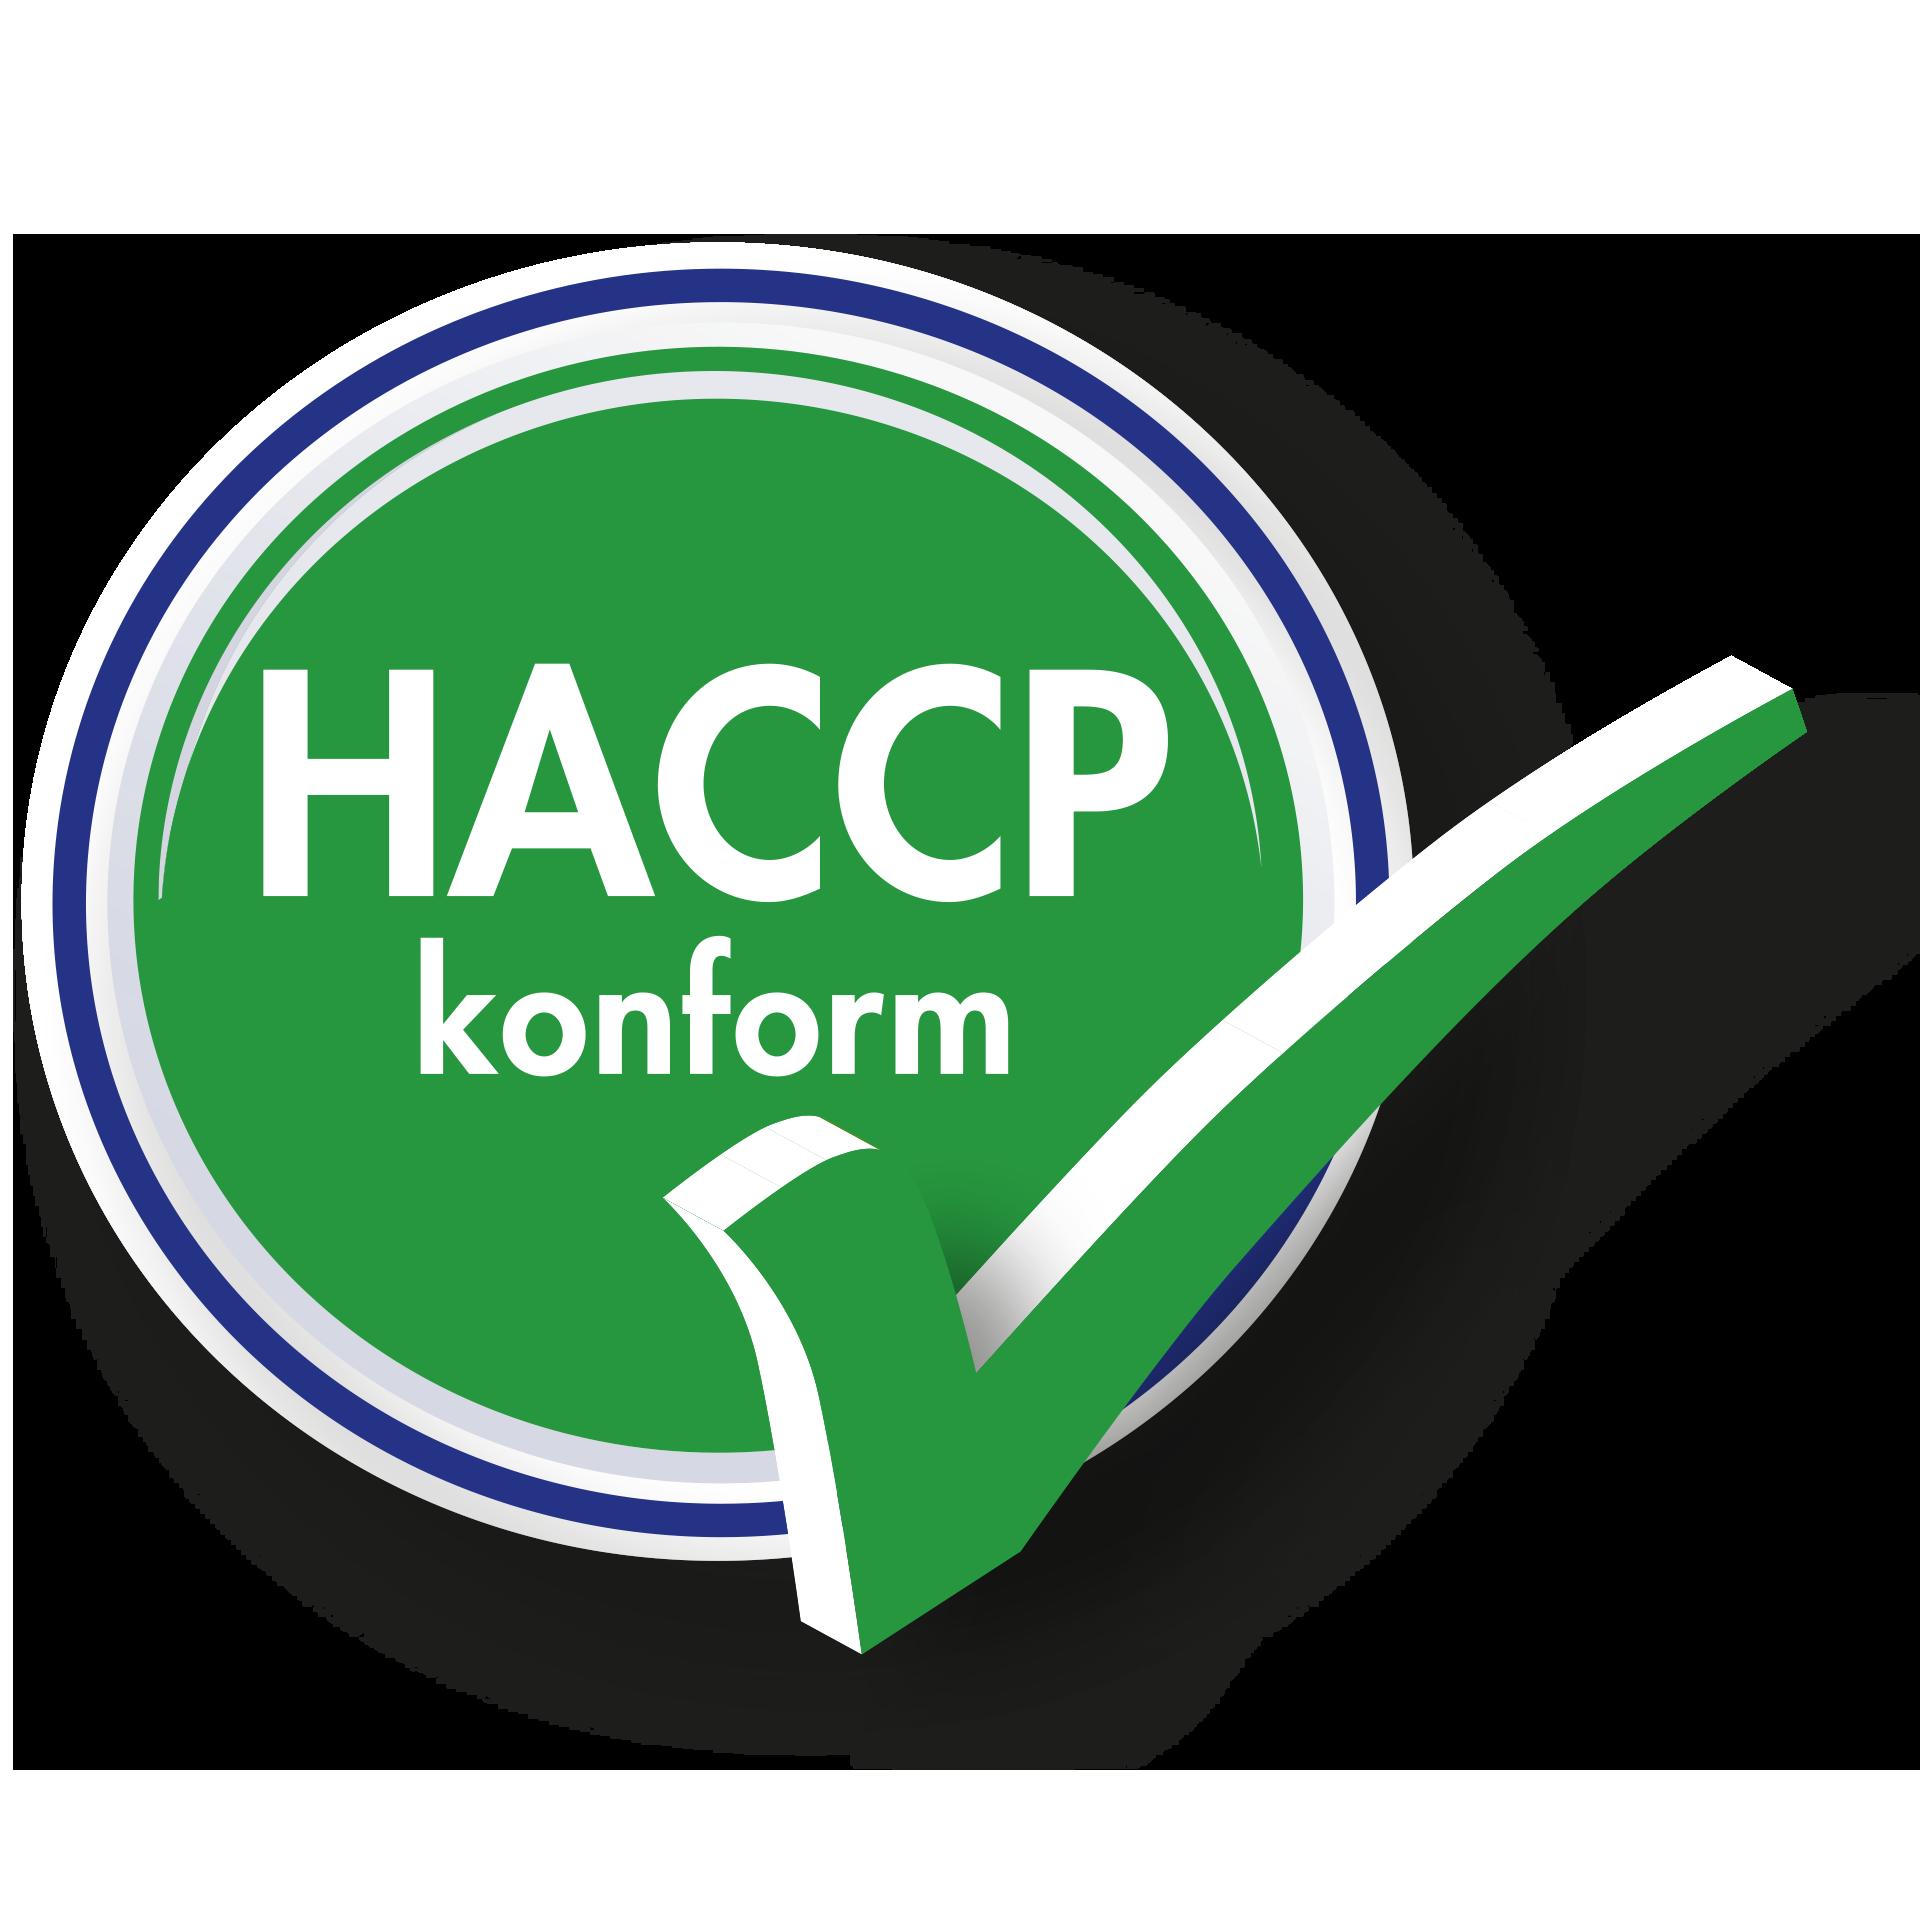 HACCP konform